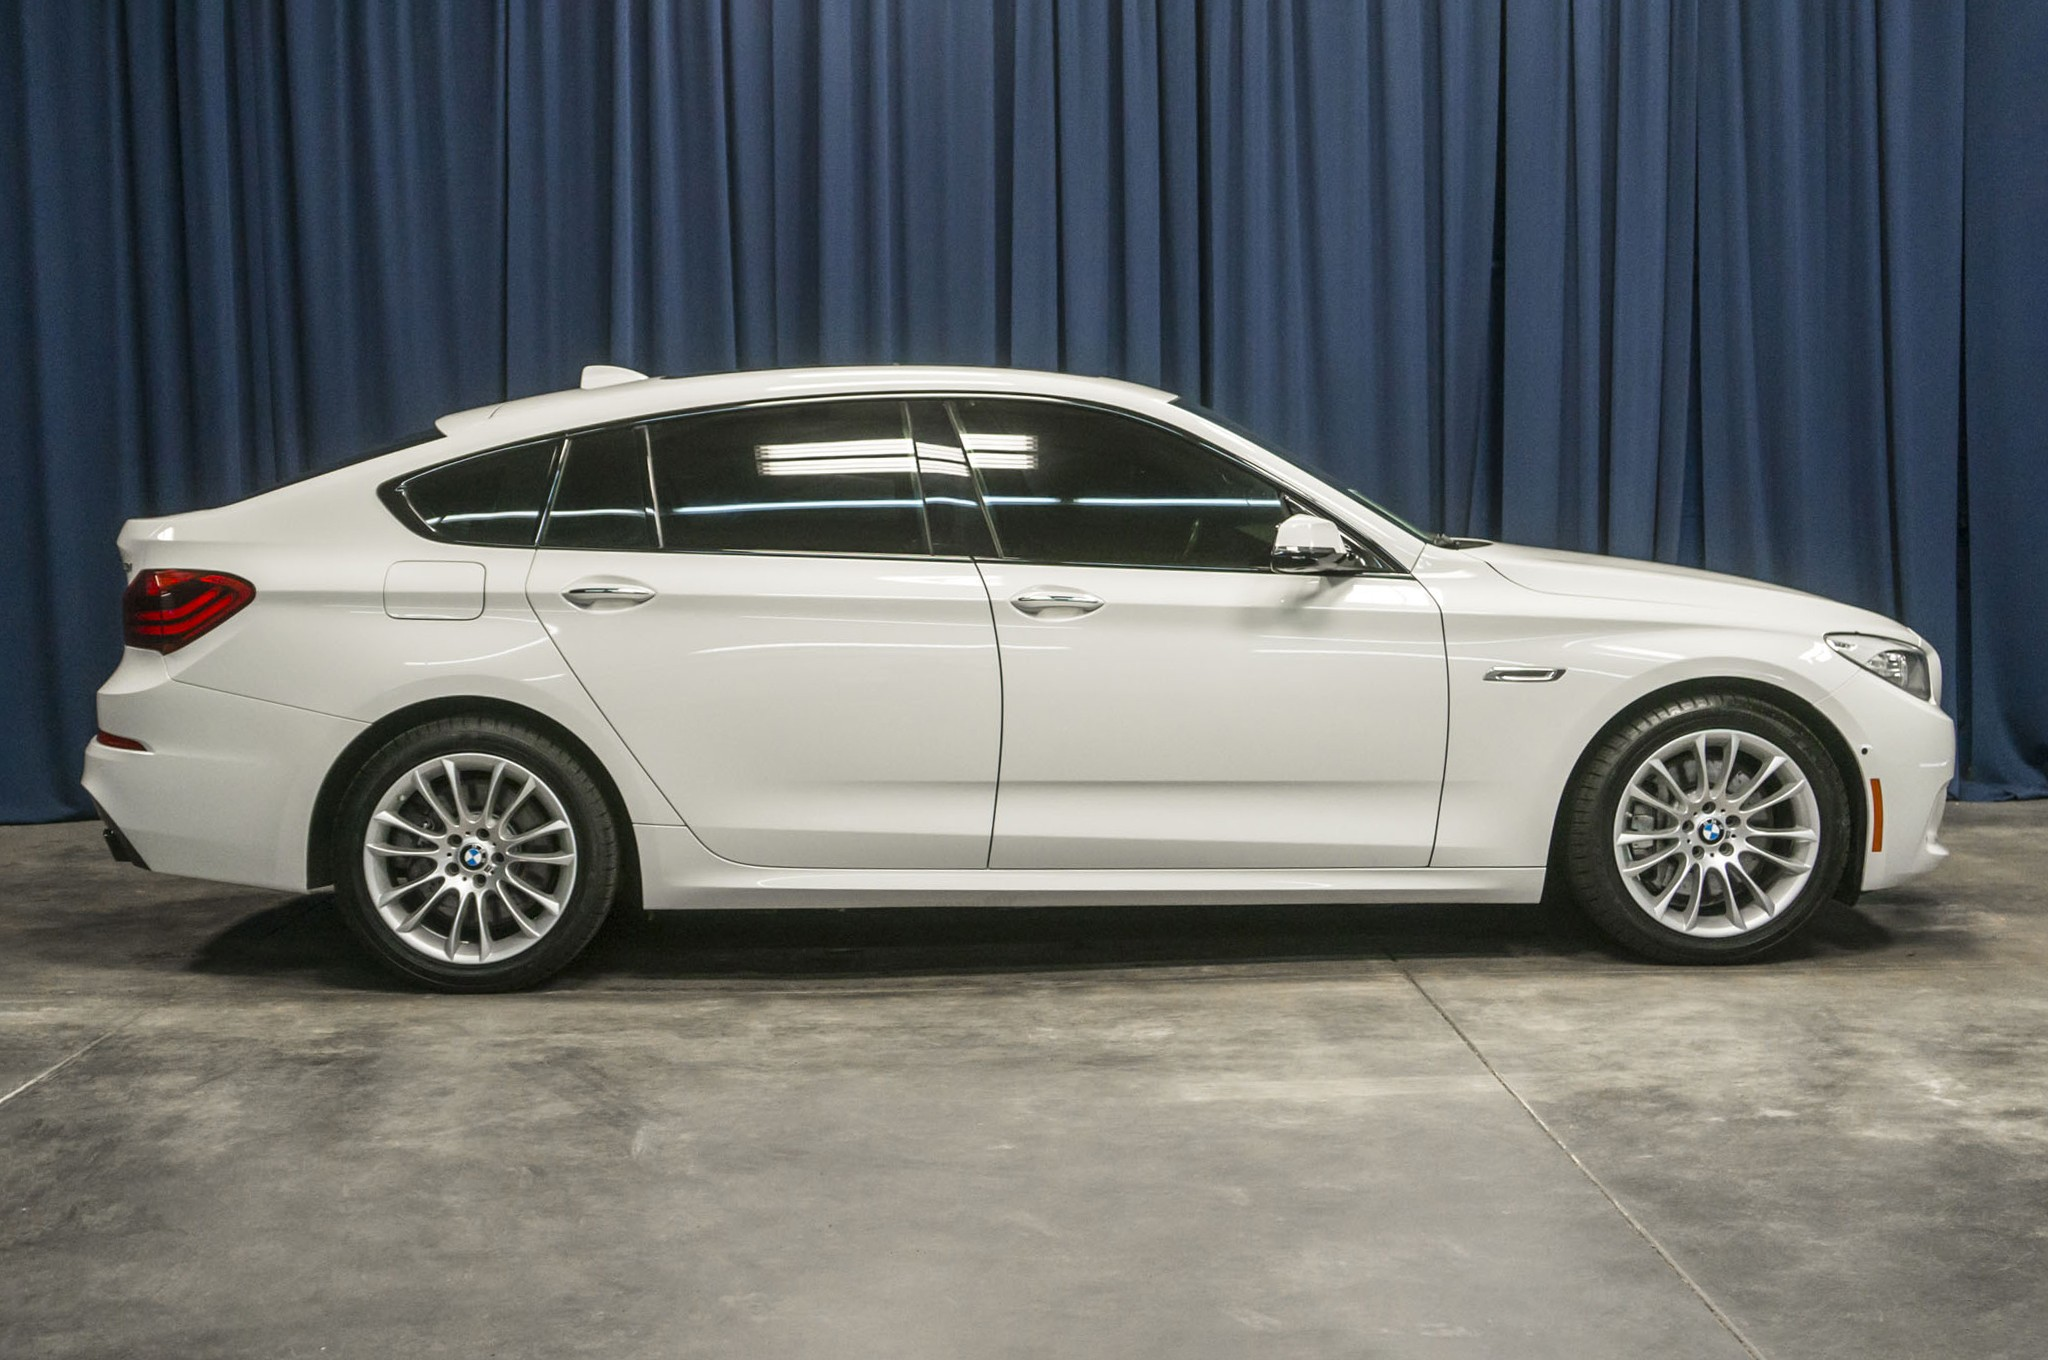 Used BMW GT I XDrive AWD Series Hatchback For Sale - 550 gt bmw